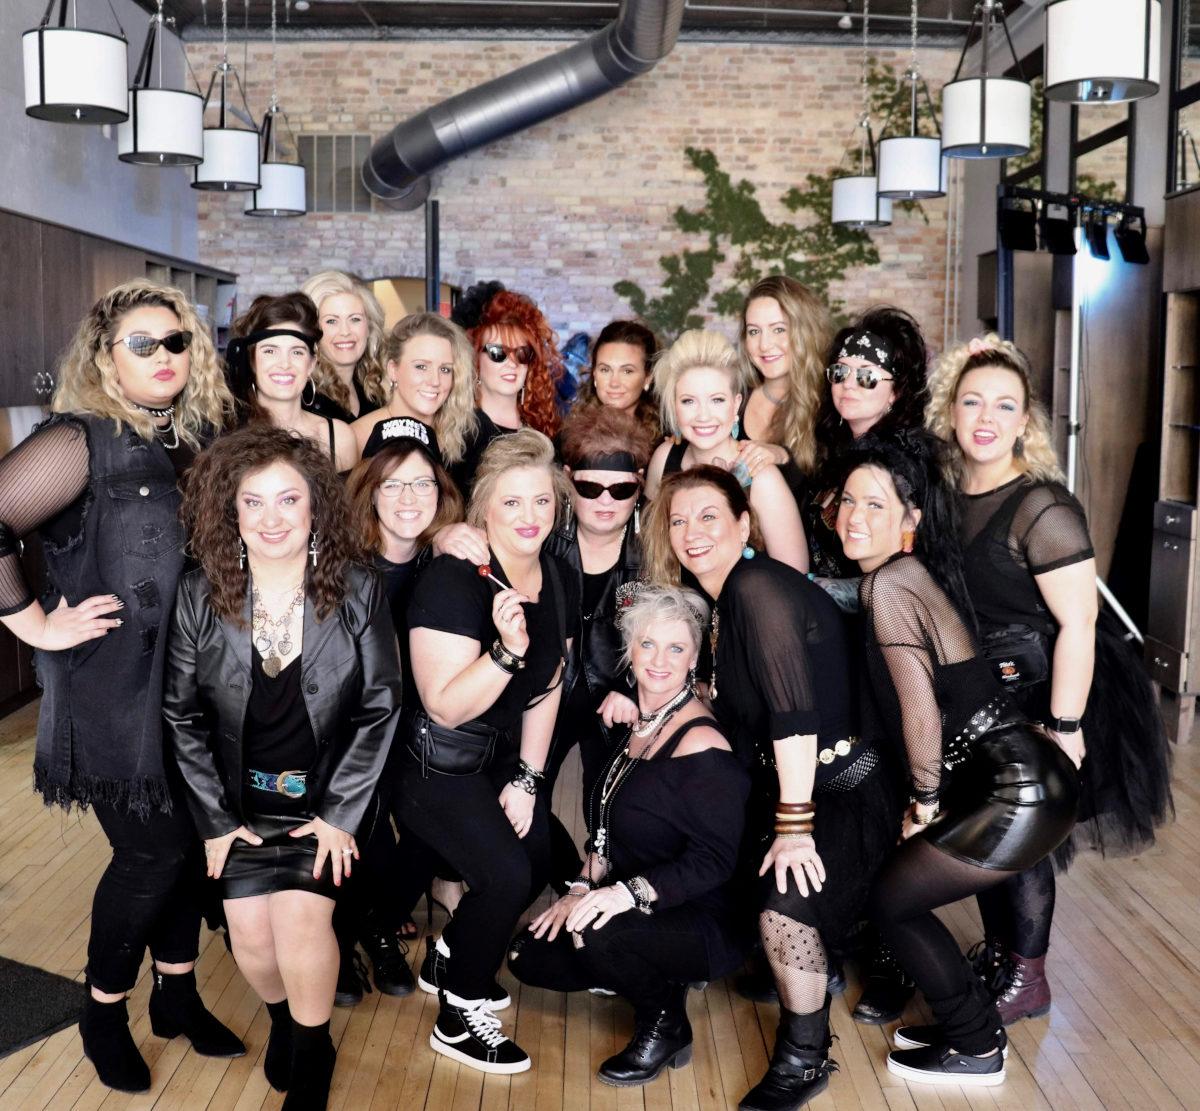 Dam Salon Spa team